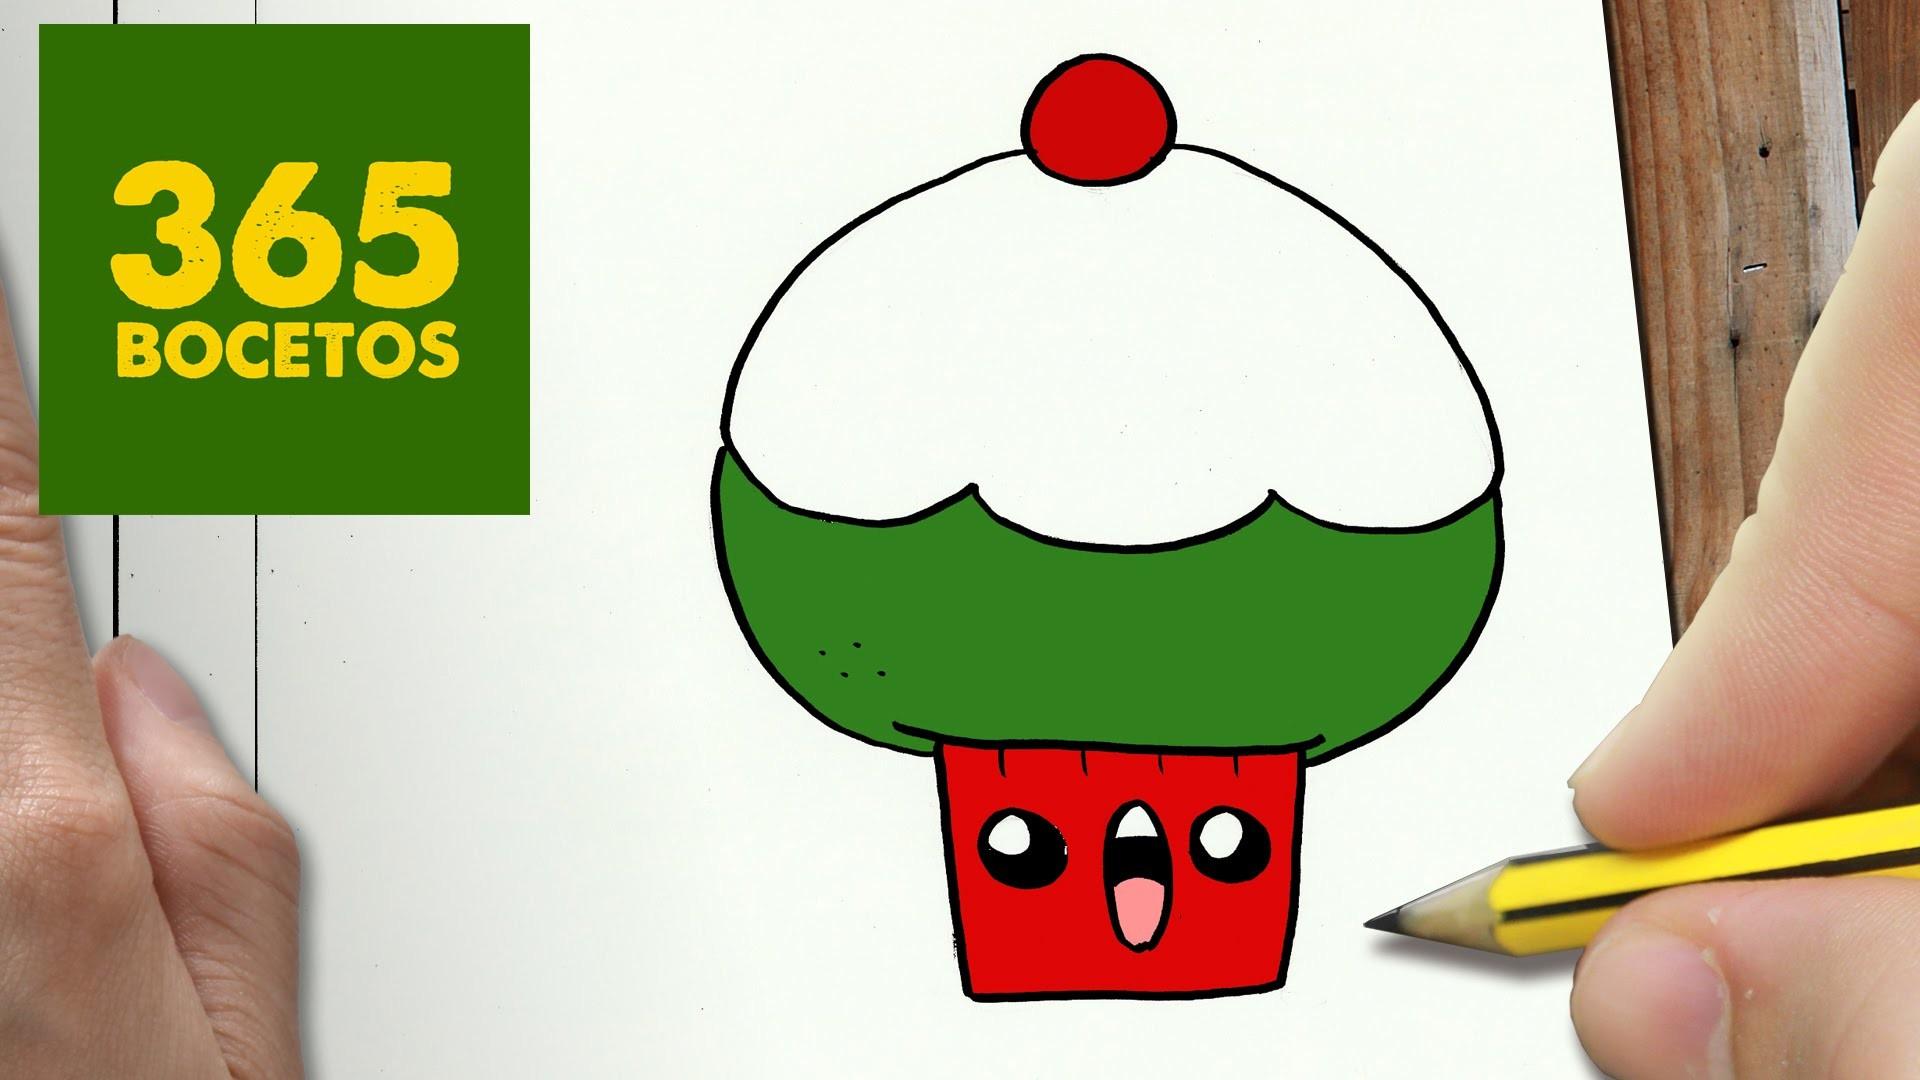 Como Dibujar Un Cuaderno Para Navidad Paso A Paso Dibujos: COMO DIBUJAR UN CUPCAKE PARA NAVIDAD PASO A PASO: Dibujos